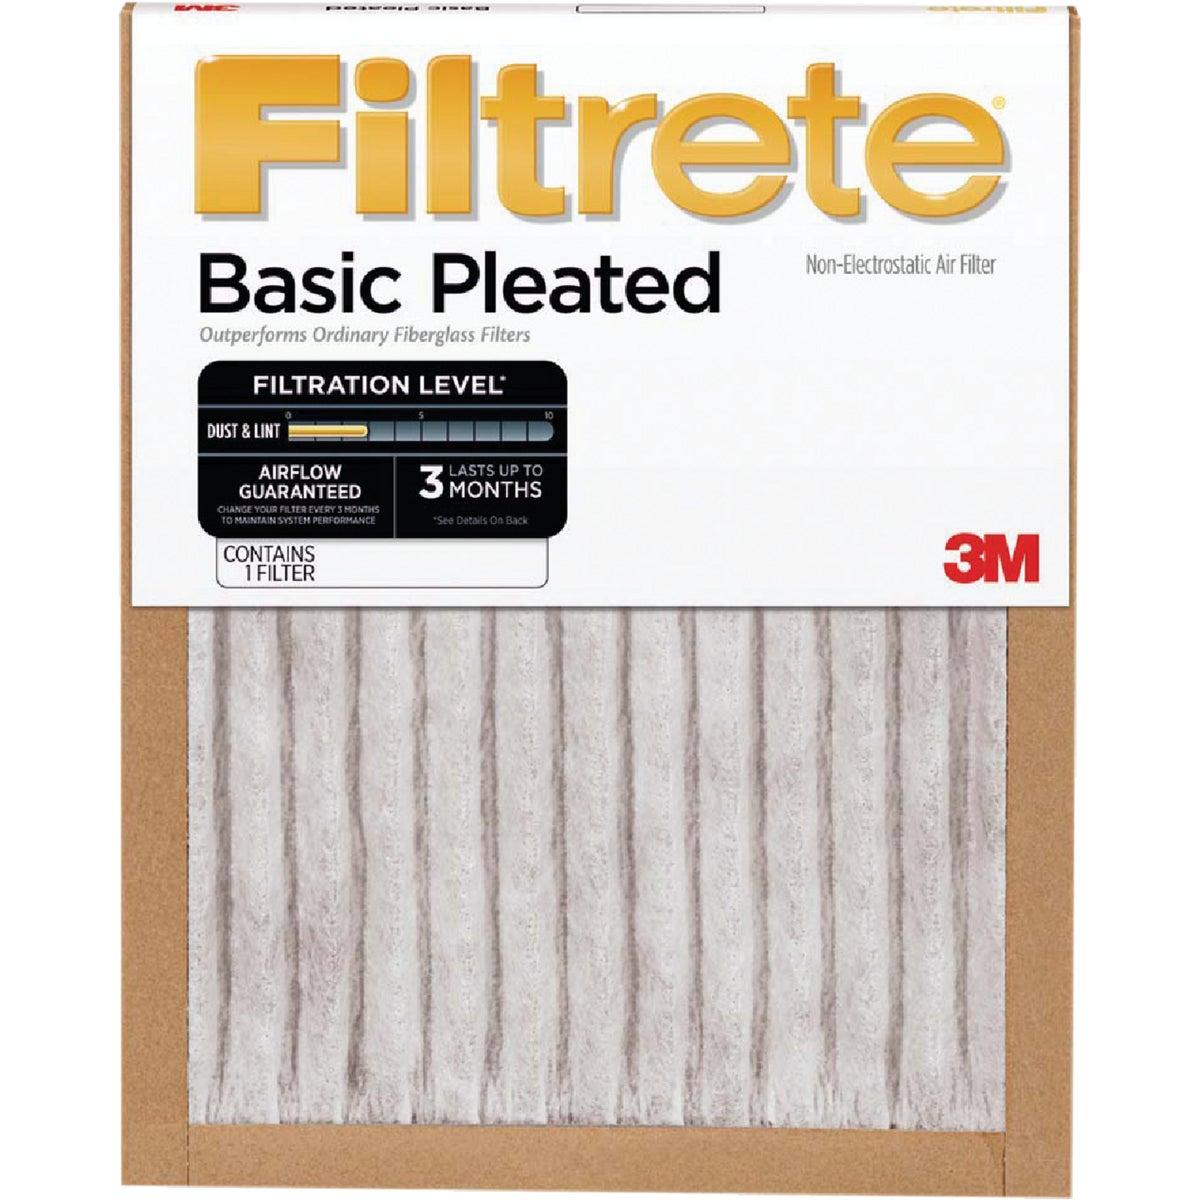 3M Filtrete 16 In. x 20 In. x 1 In. Basic Pleated 250 MPR Furnace Filter